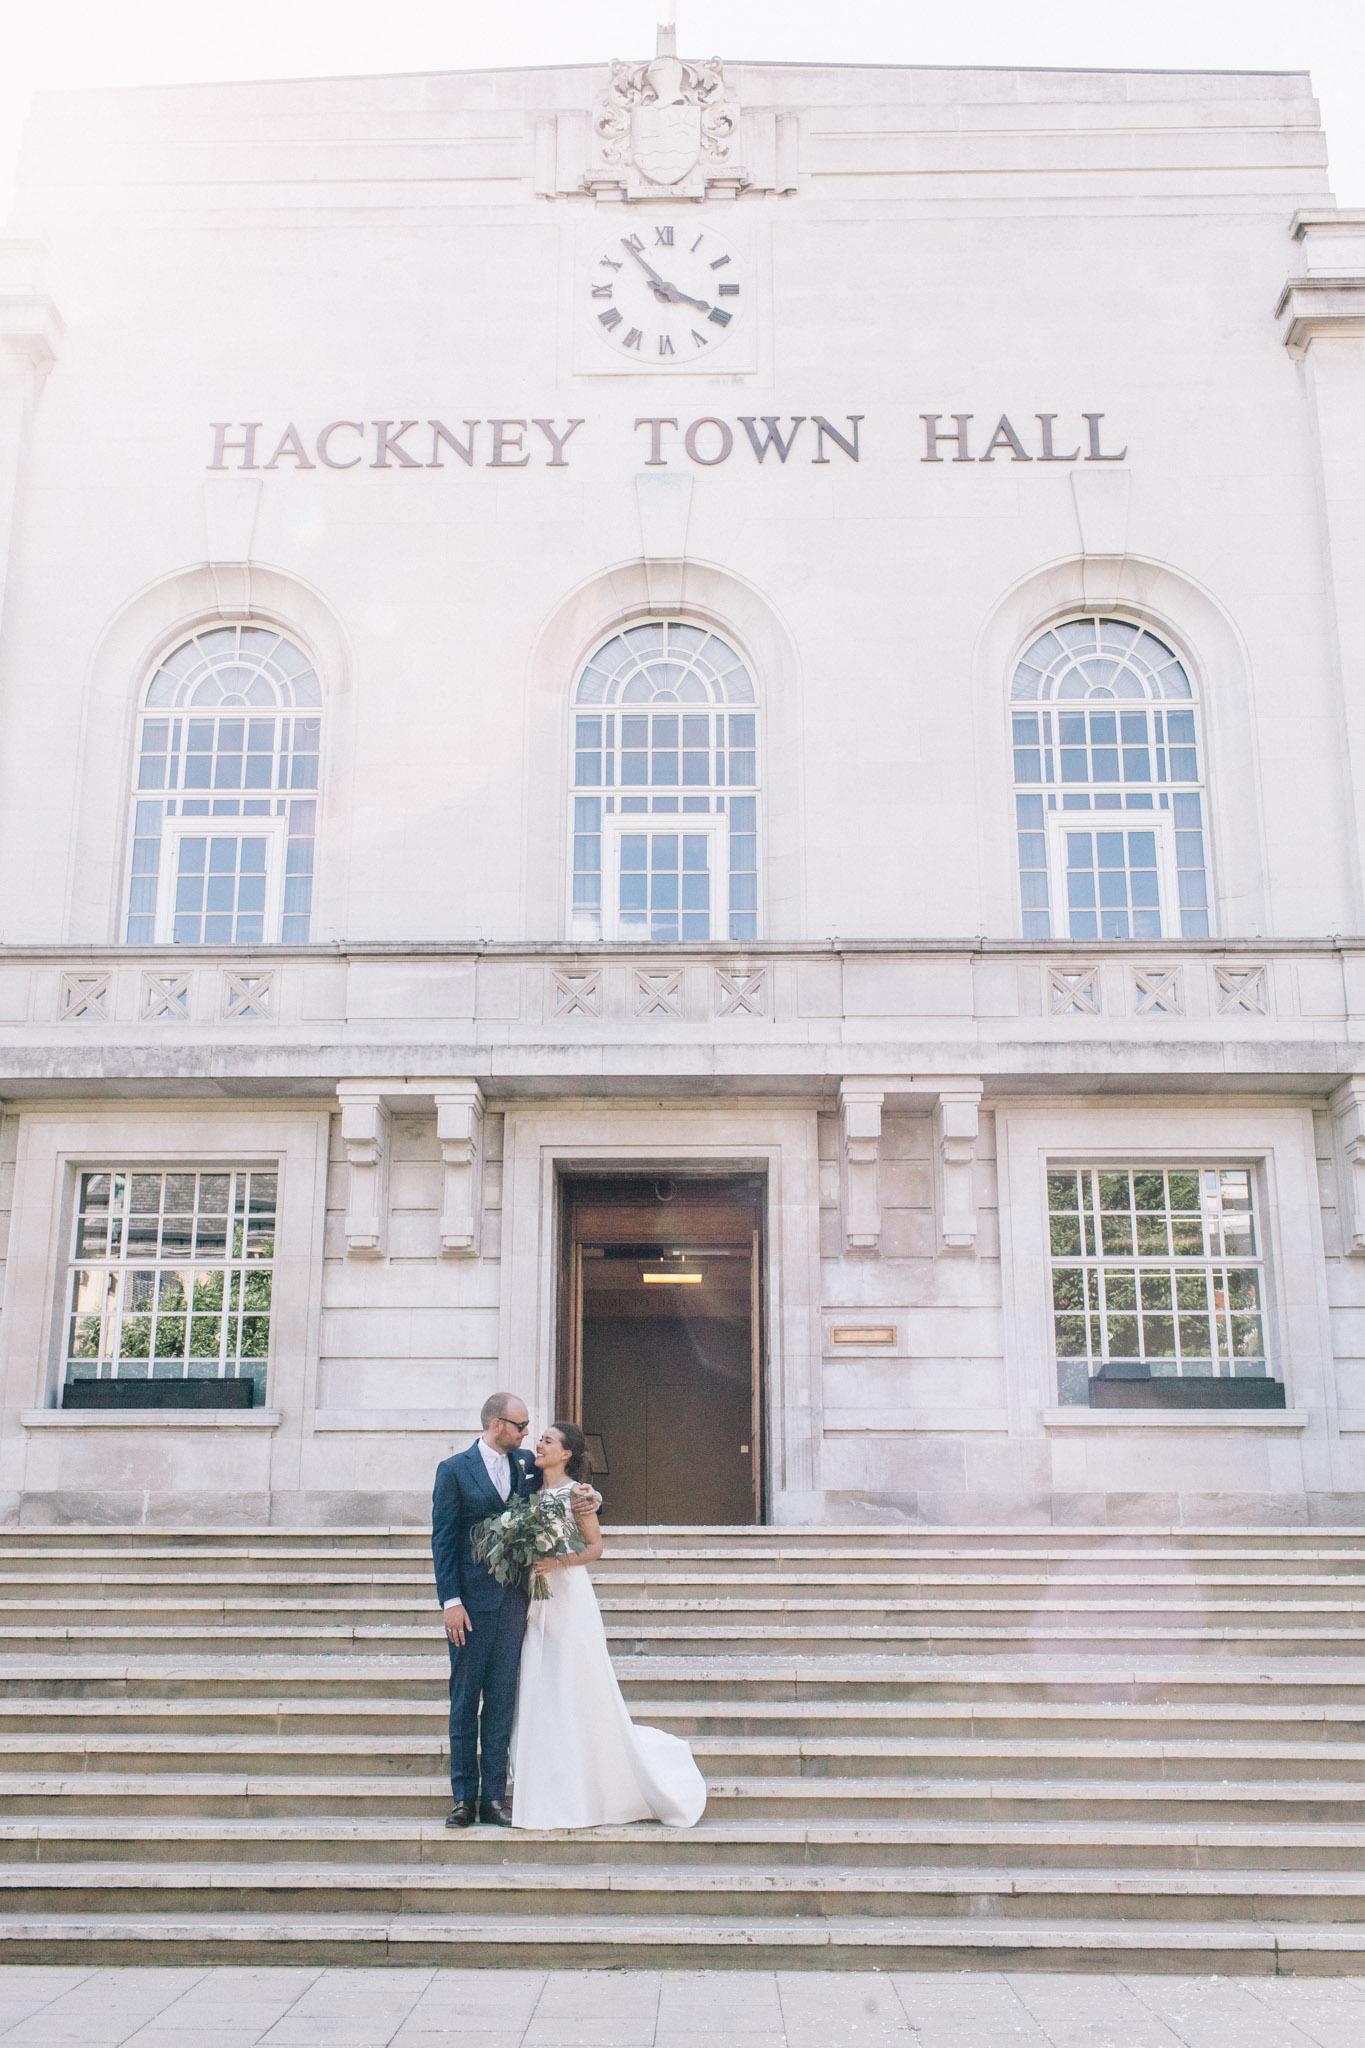 trinity_buoy_wharf_hackney_town_hall_wedding_383.jpg